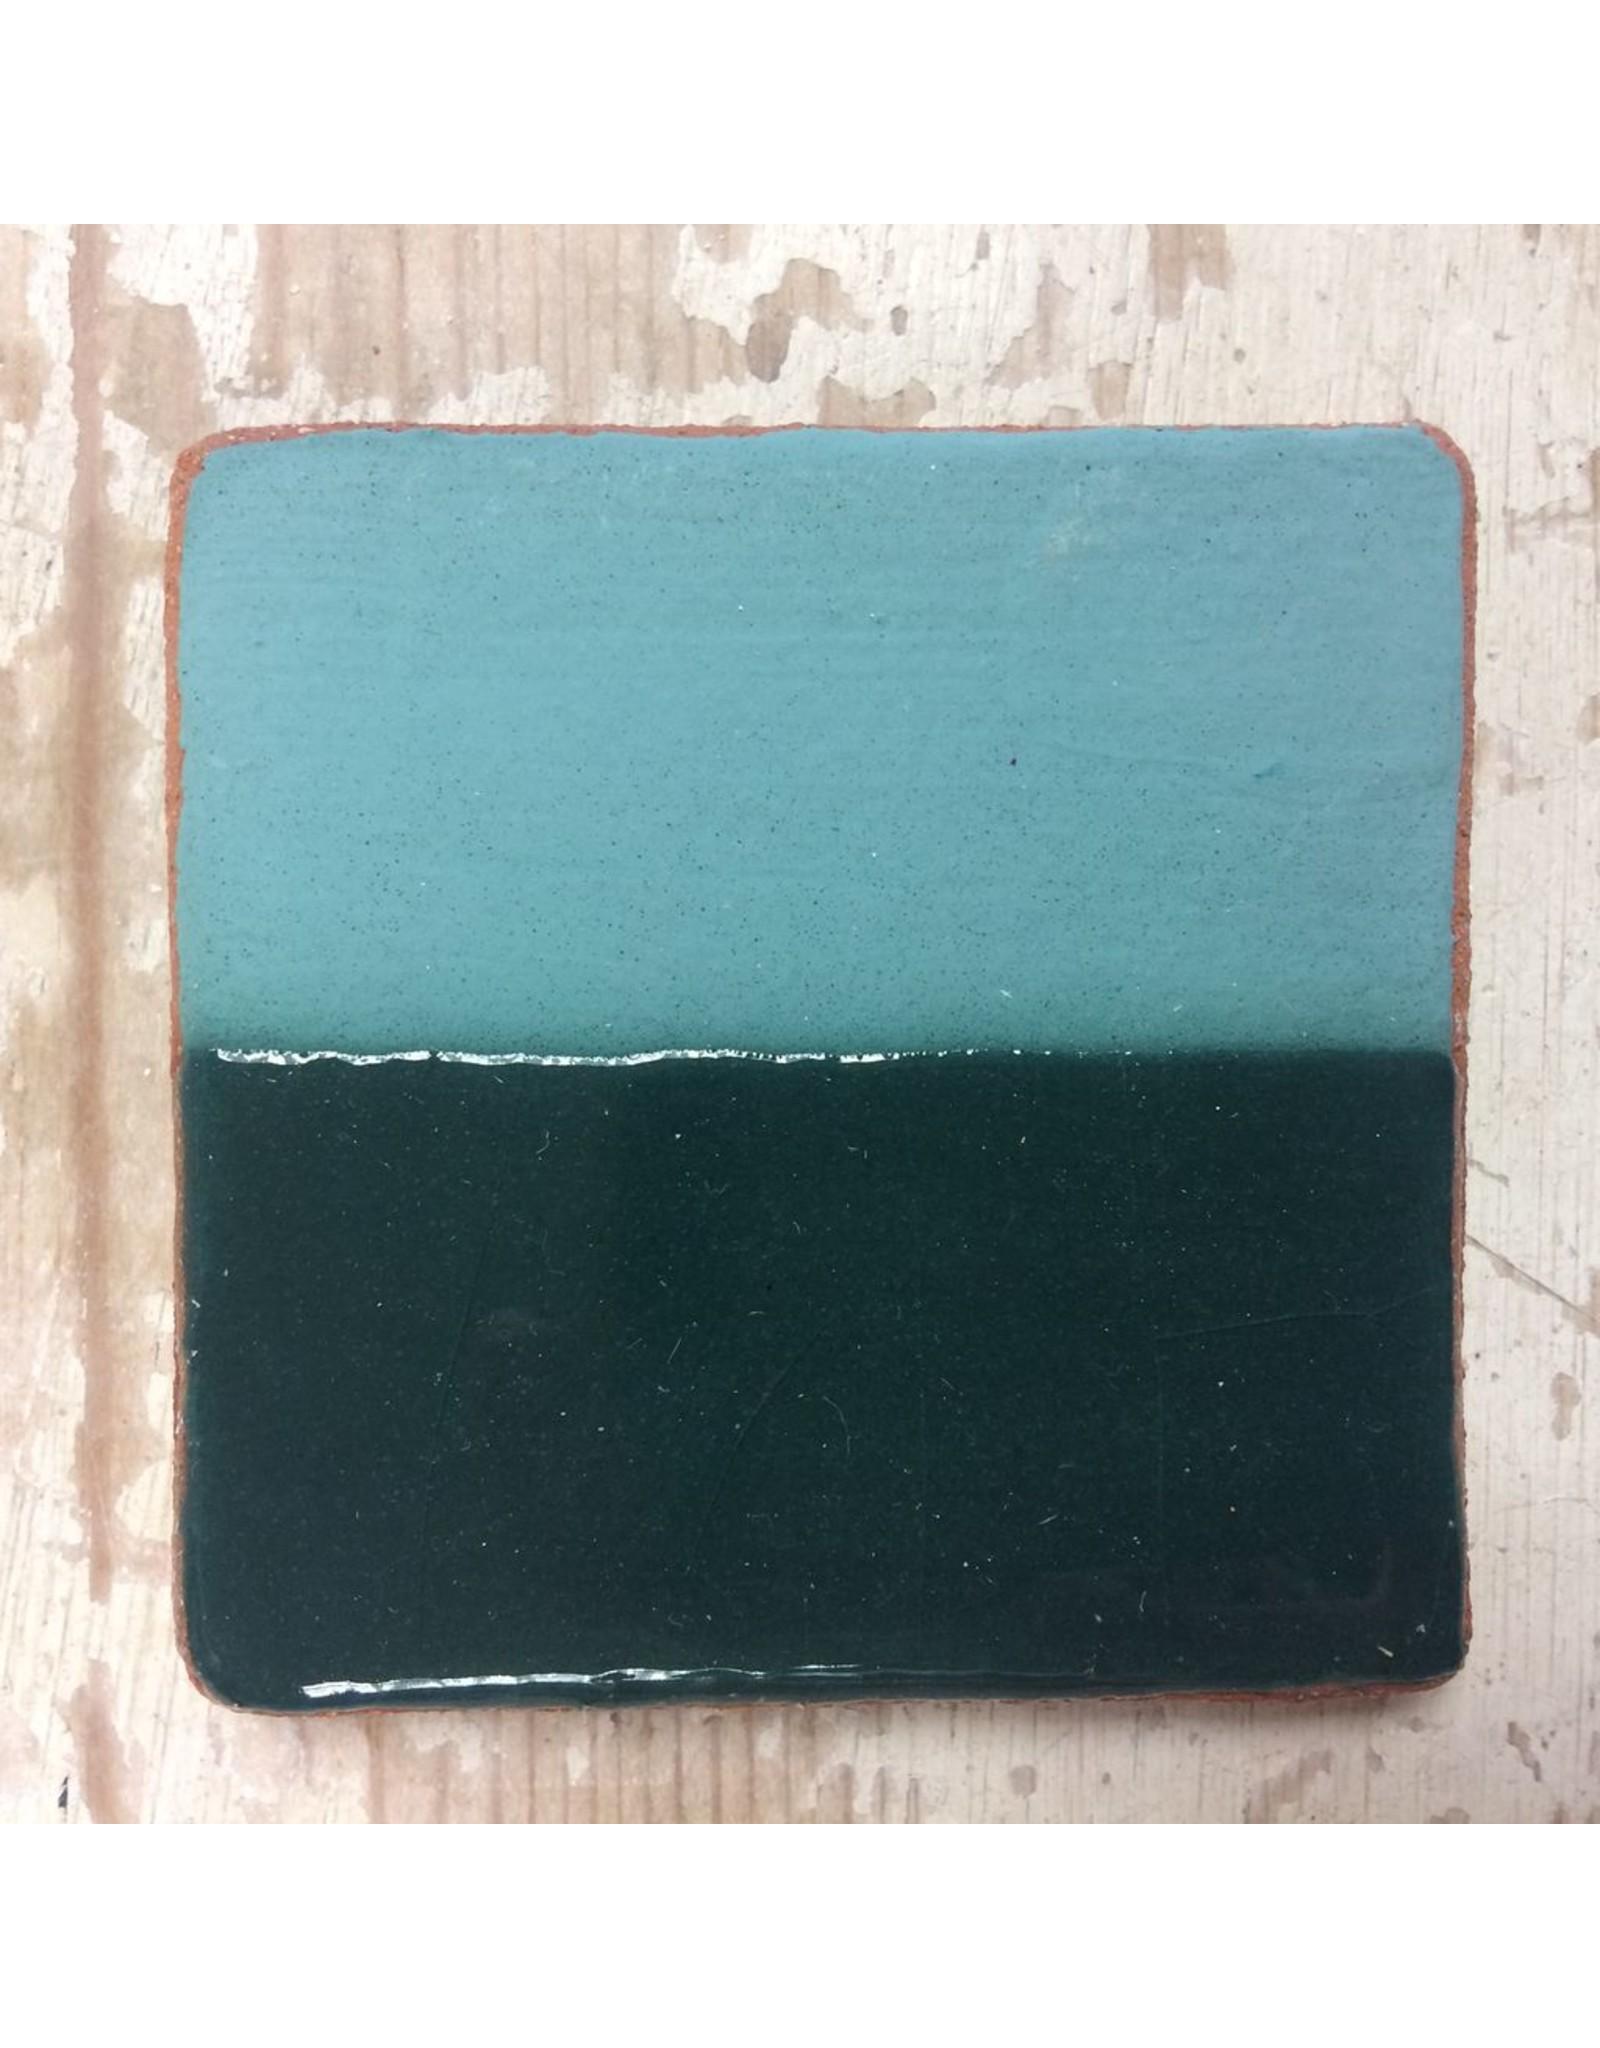 Scarva Mallard Green Decorating Slip 1 litre